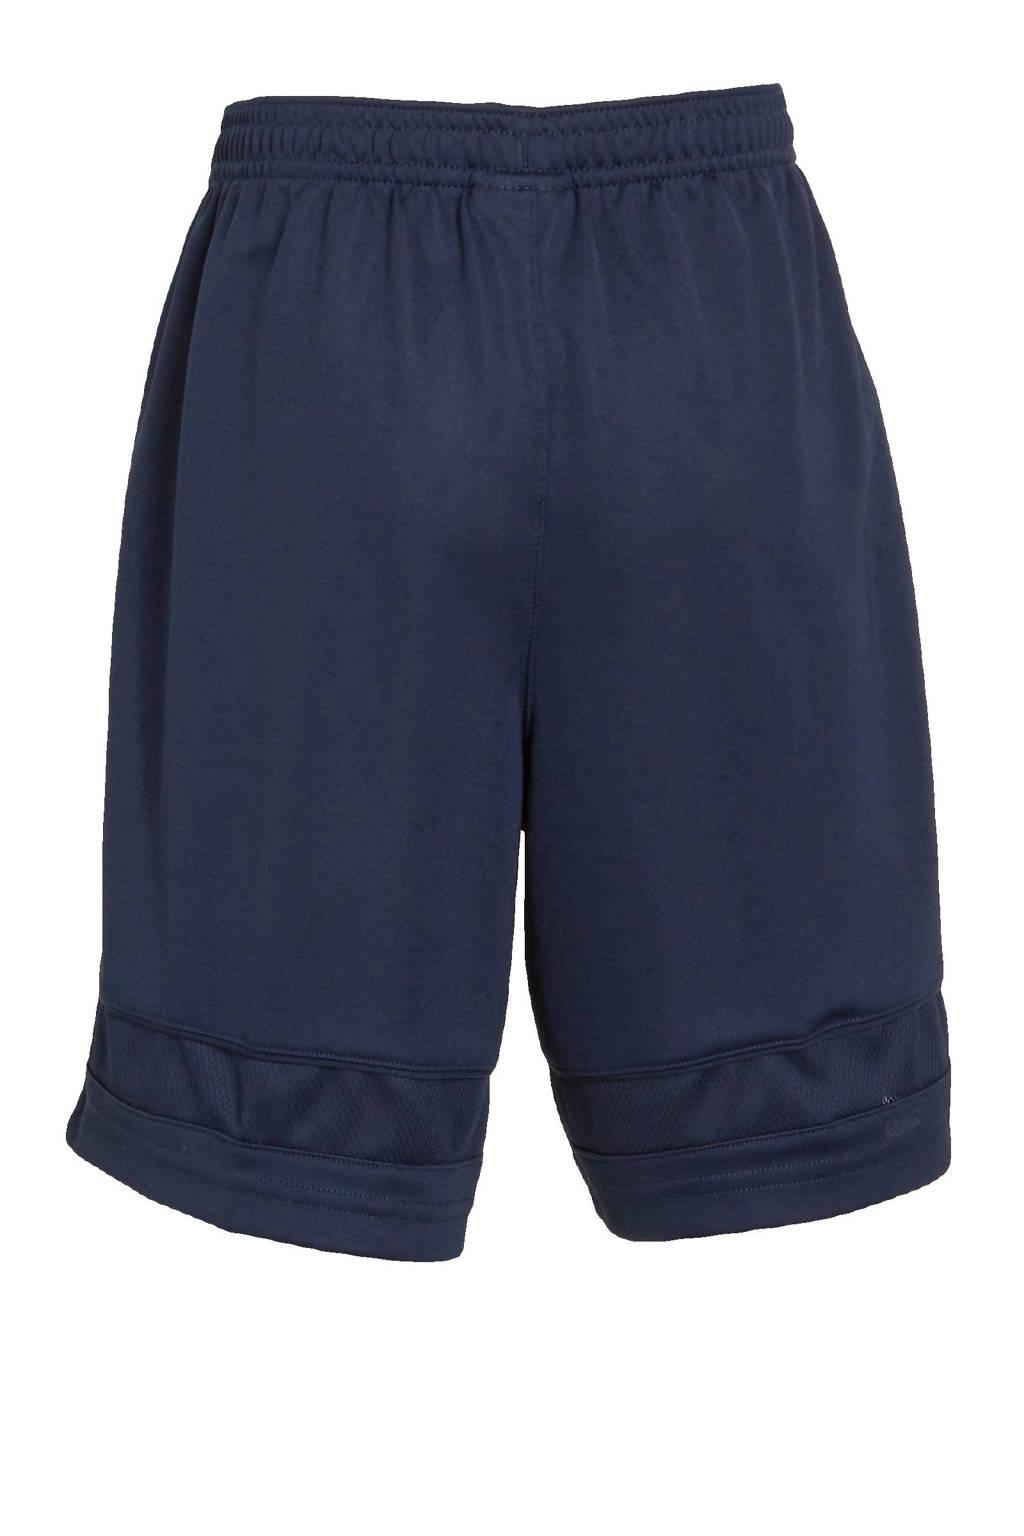 Nike   sportshort donkerblauw/wit, Donkerblauw/wit